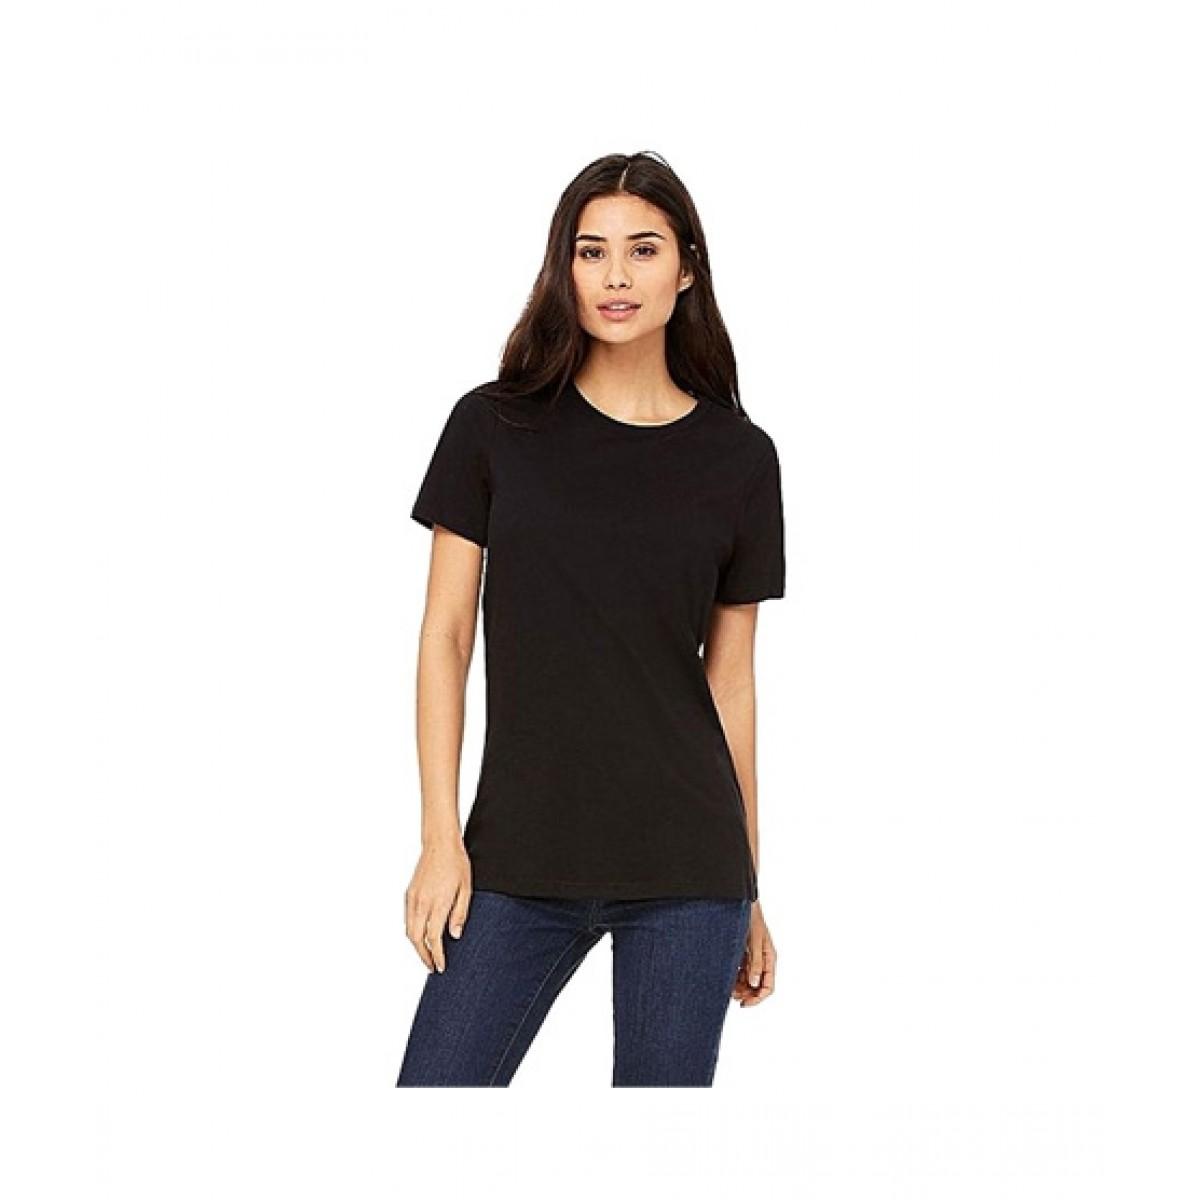 3fc86ce2c77f C-Tees Plain Black T-Shirt For Women Price in Pakistan | Buy C-Tees Plain  Black T-Shirt (CKT10181) | iShopping.pk